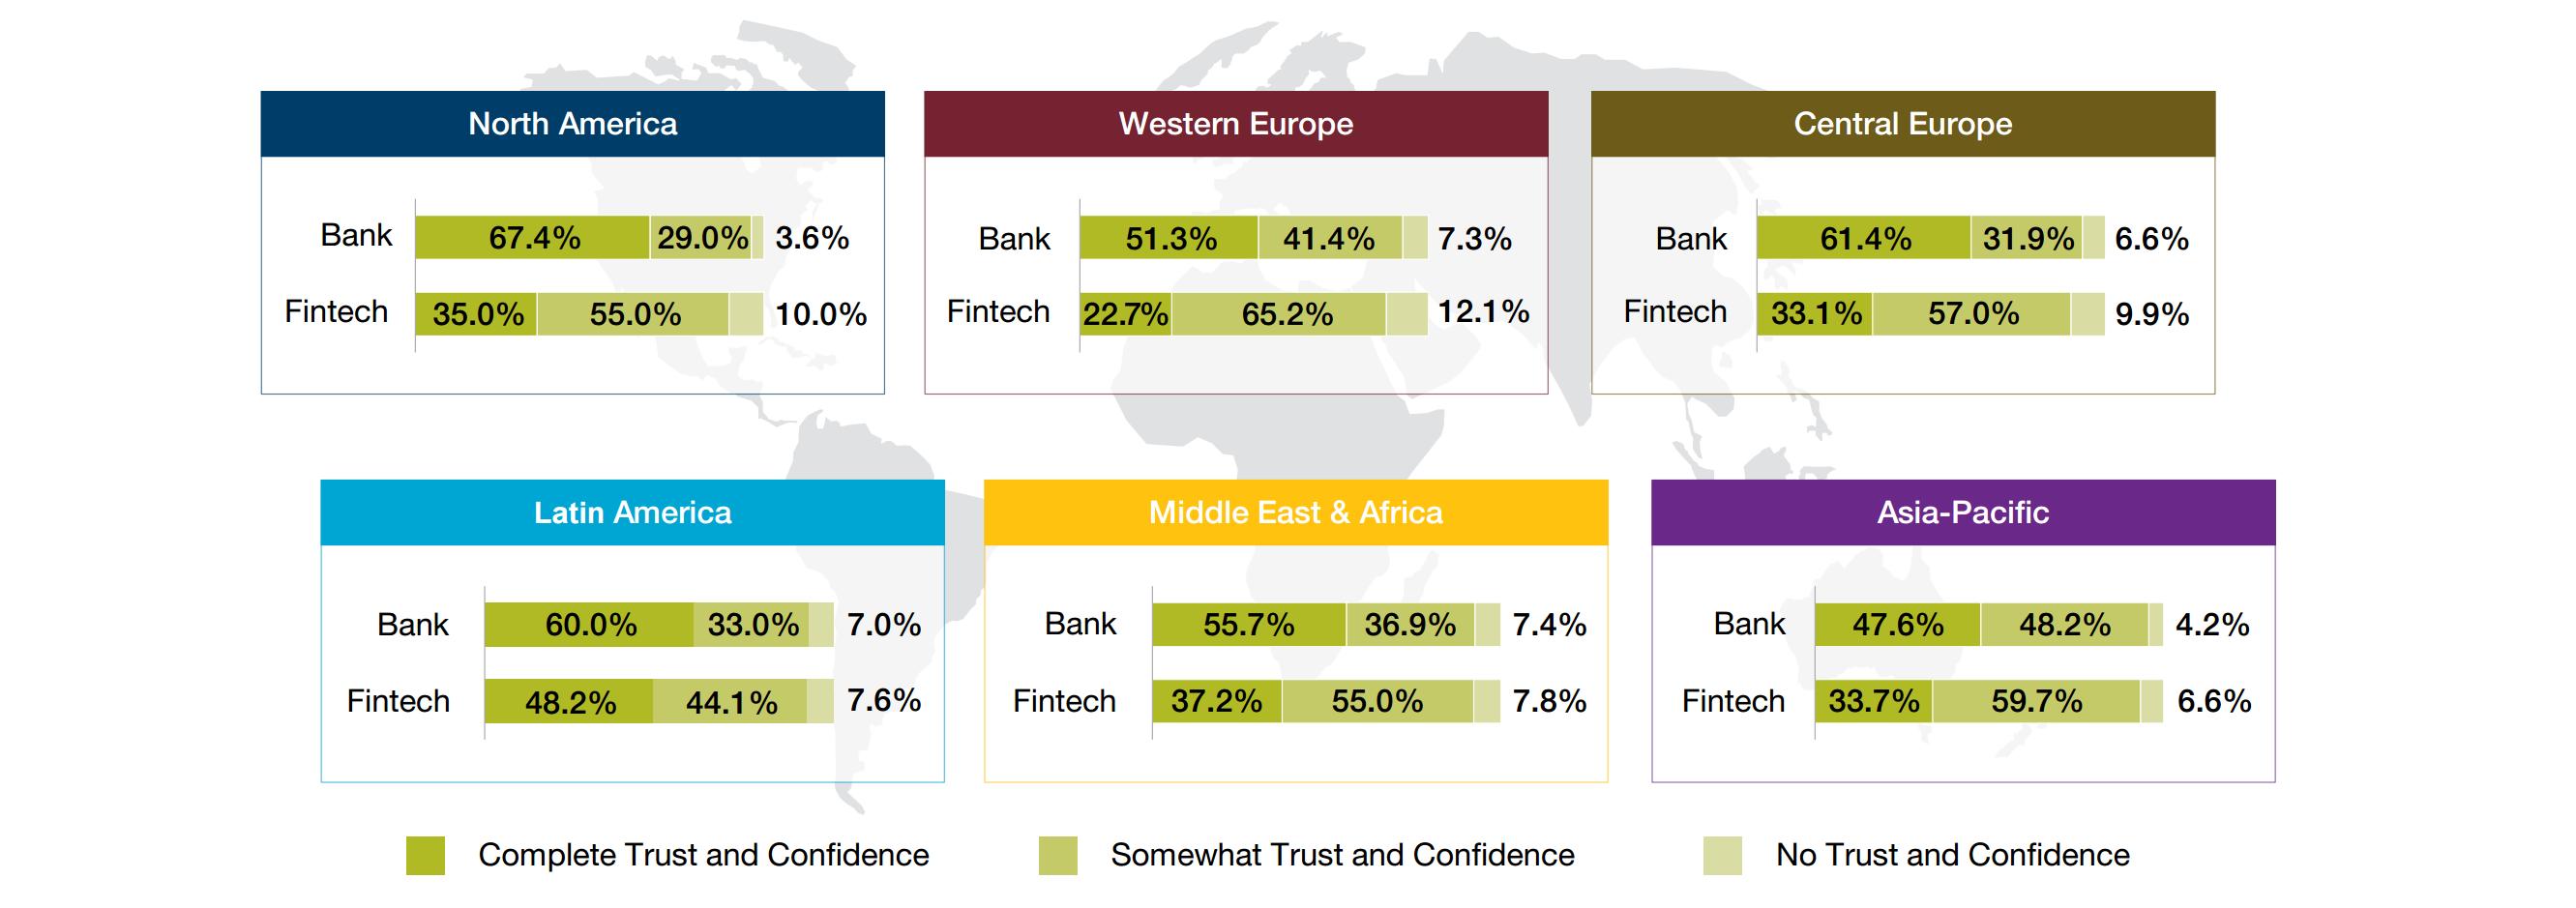 Image: World Retail Banking Report